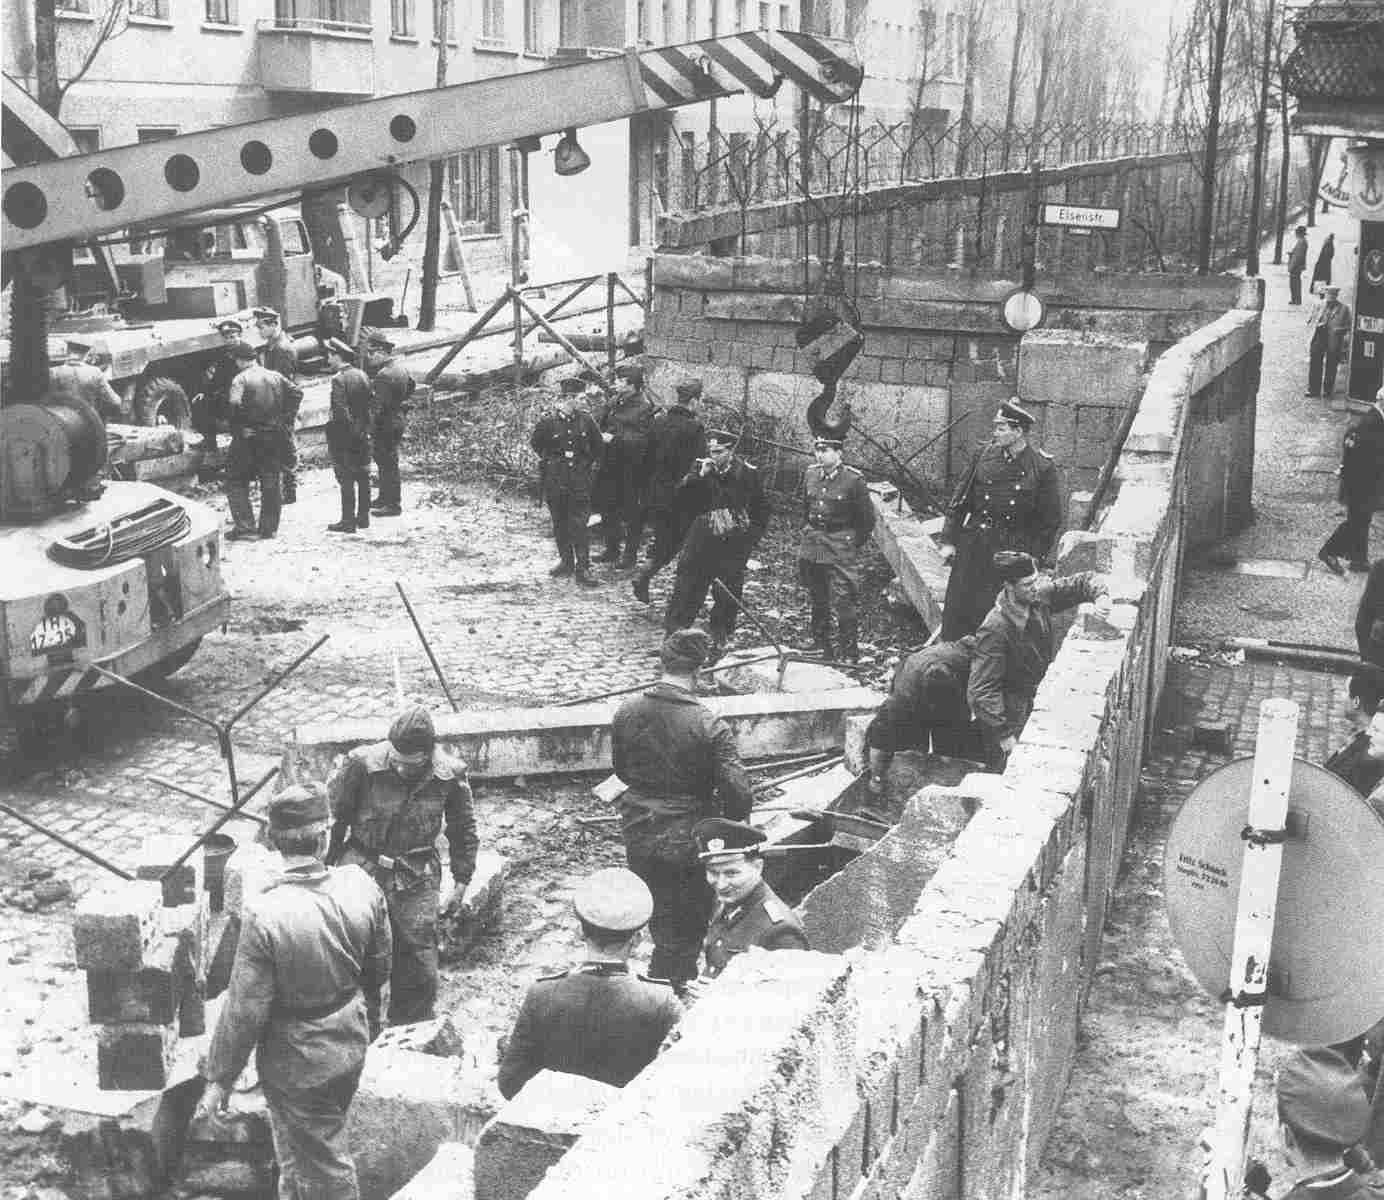 La ca 237 da del bloque socialista europeo creaci 243 n del muro